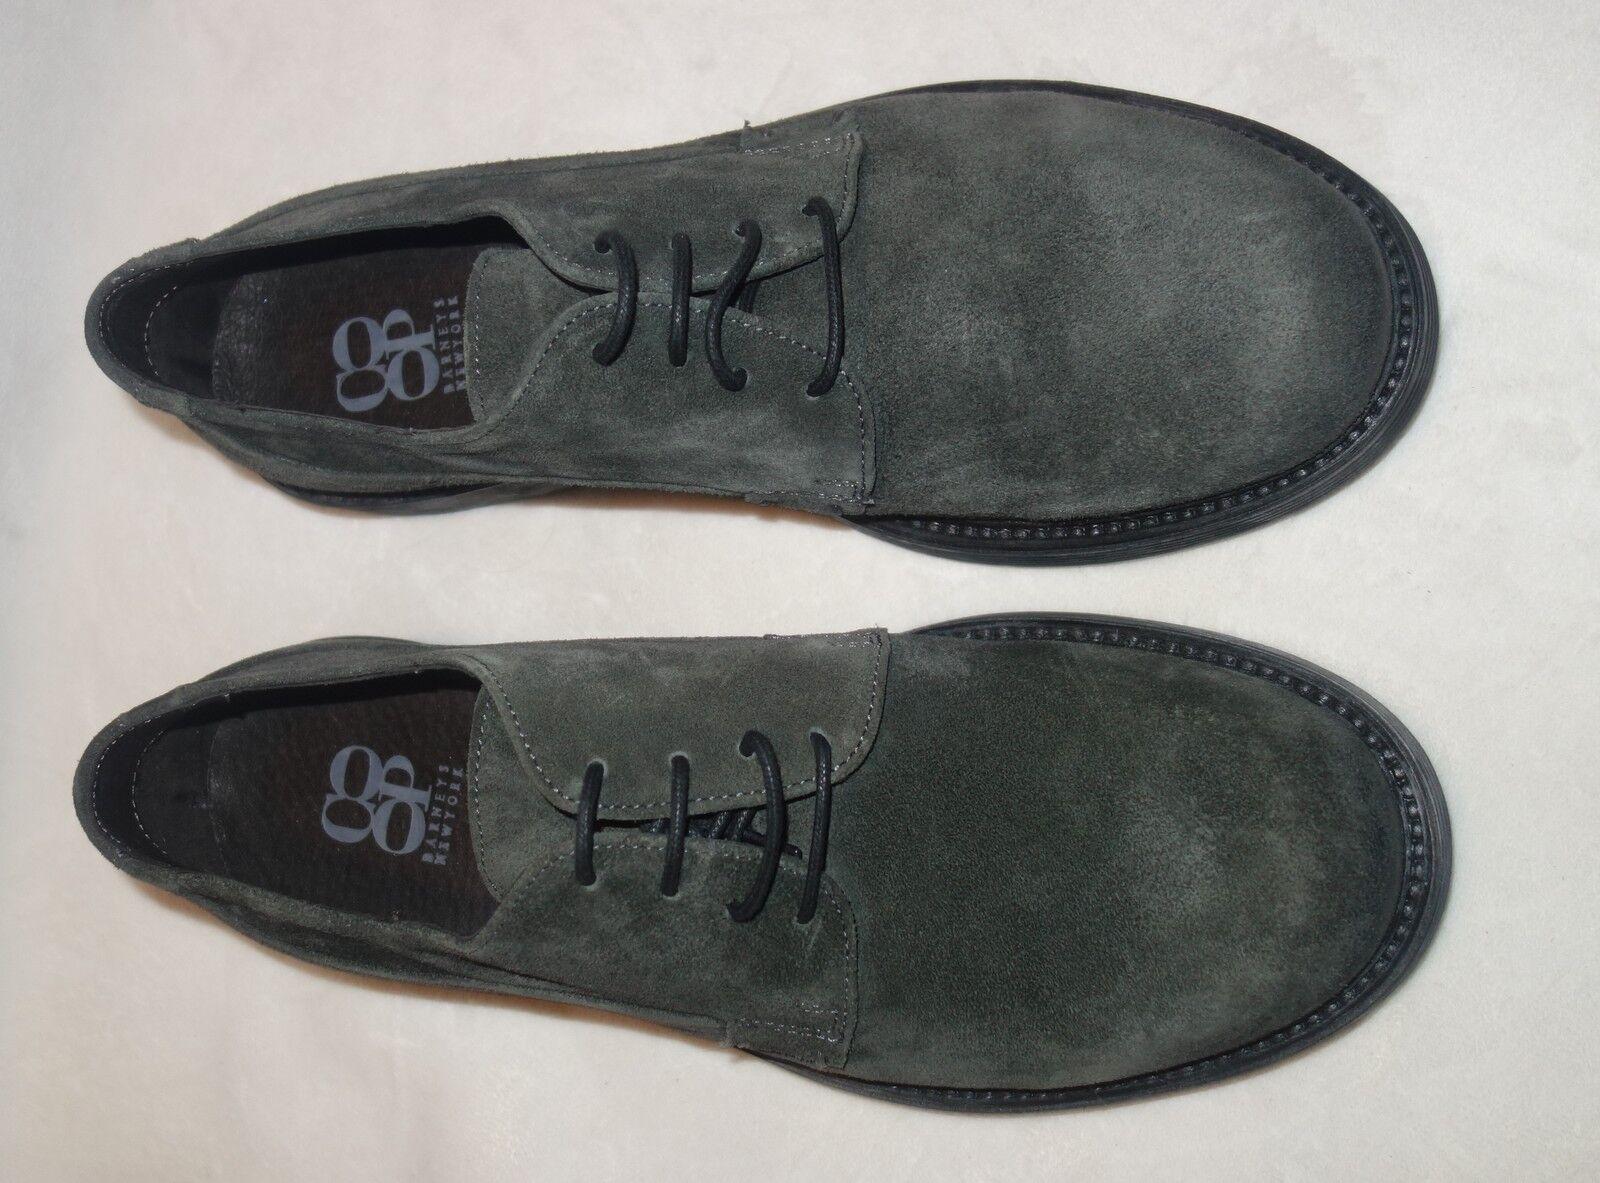 Barneys NY Uomo Grim Asfalto Grigio Size Lace Up Oxford Scarpe Size Grigio 8.5 NEW f0060c